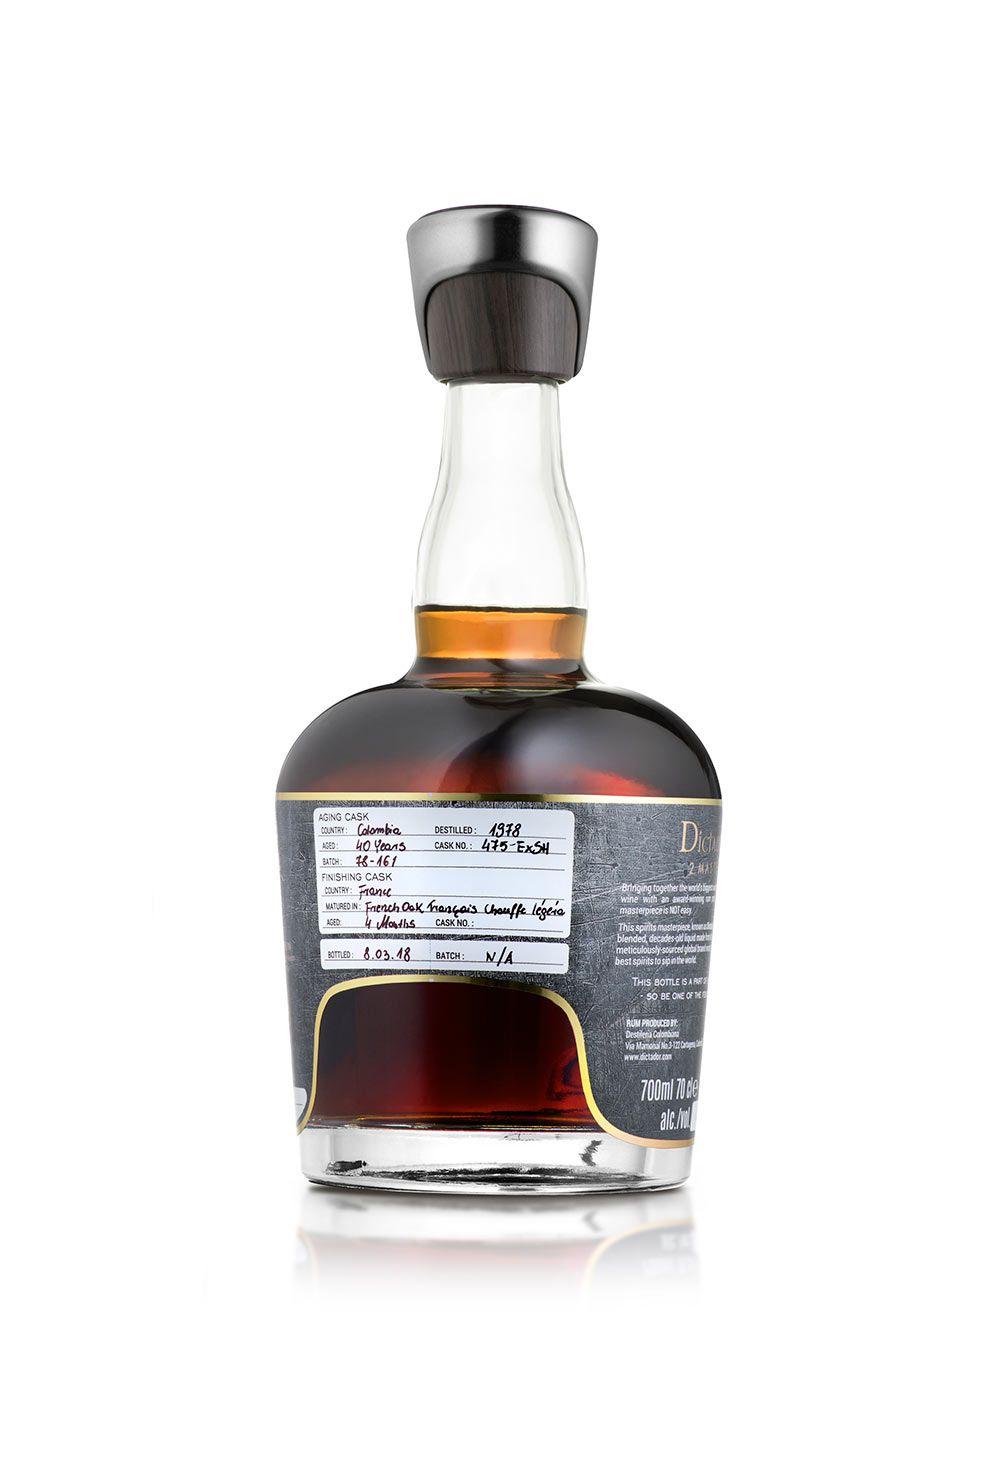 Rum Dictador 2 Masters Leclerc Briant 1979